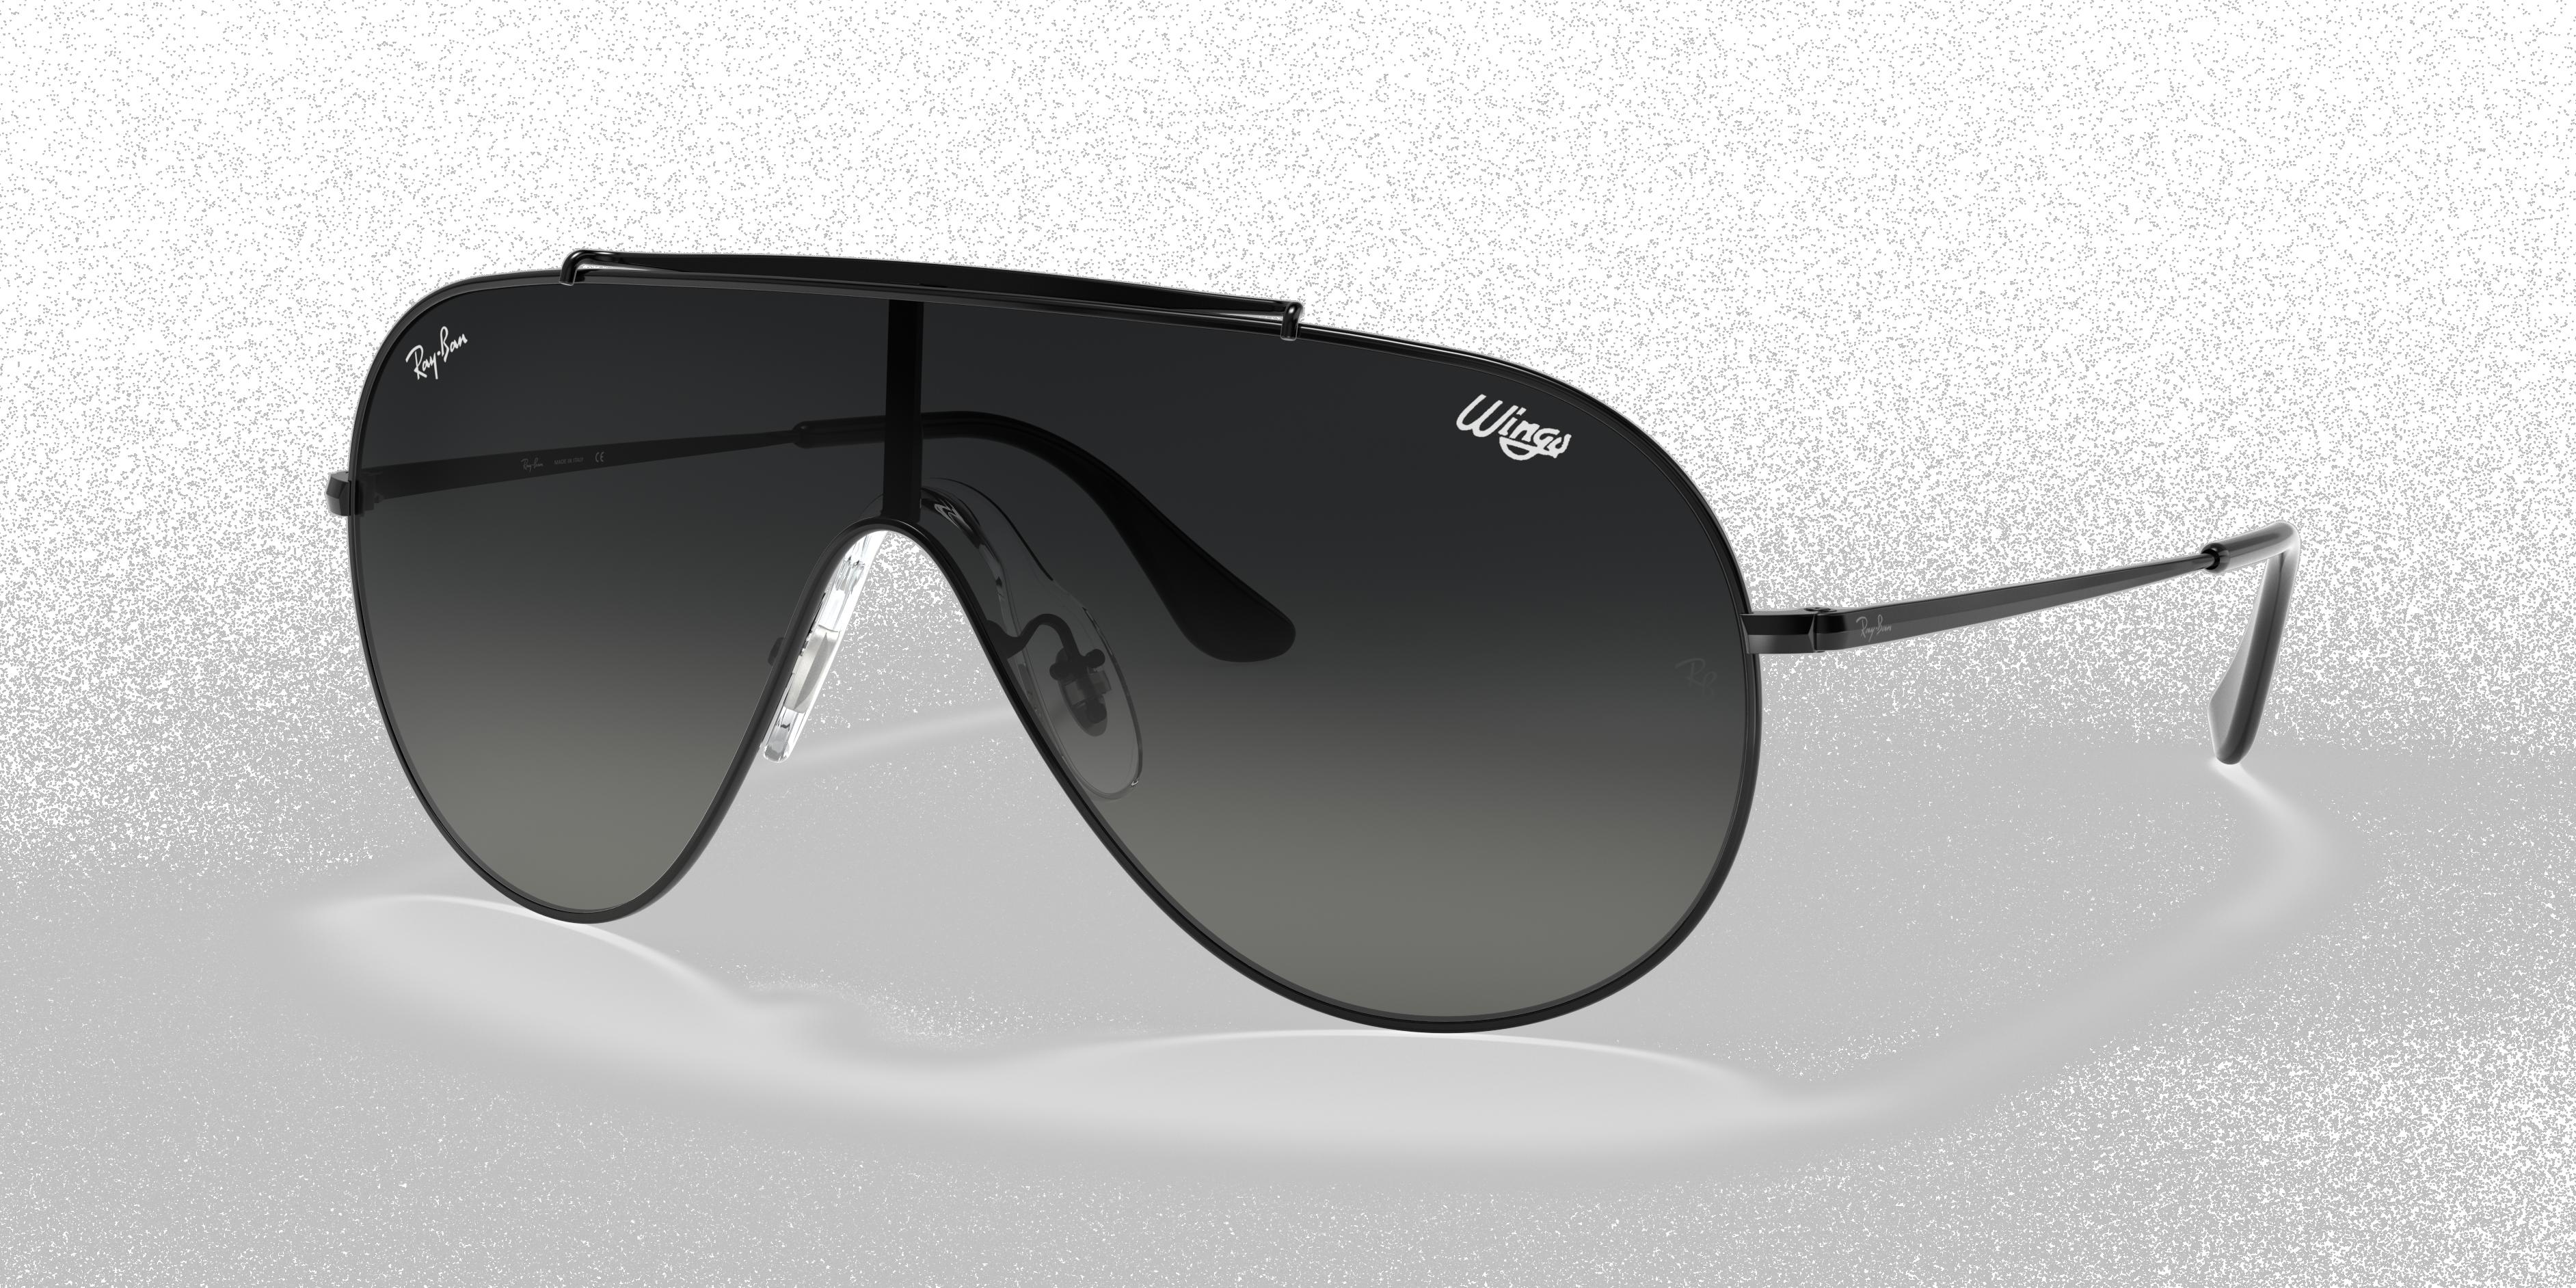 Ray-Ban Wings Black, Gray Lenses - RB3597